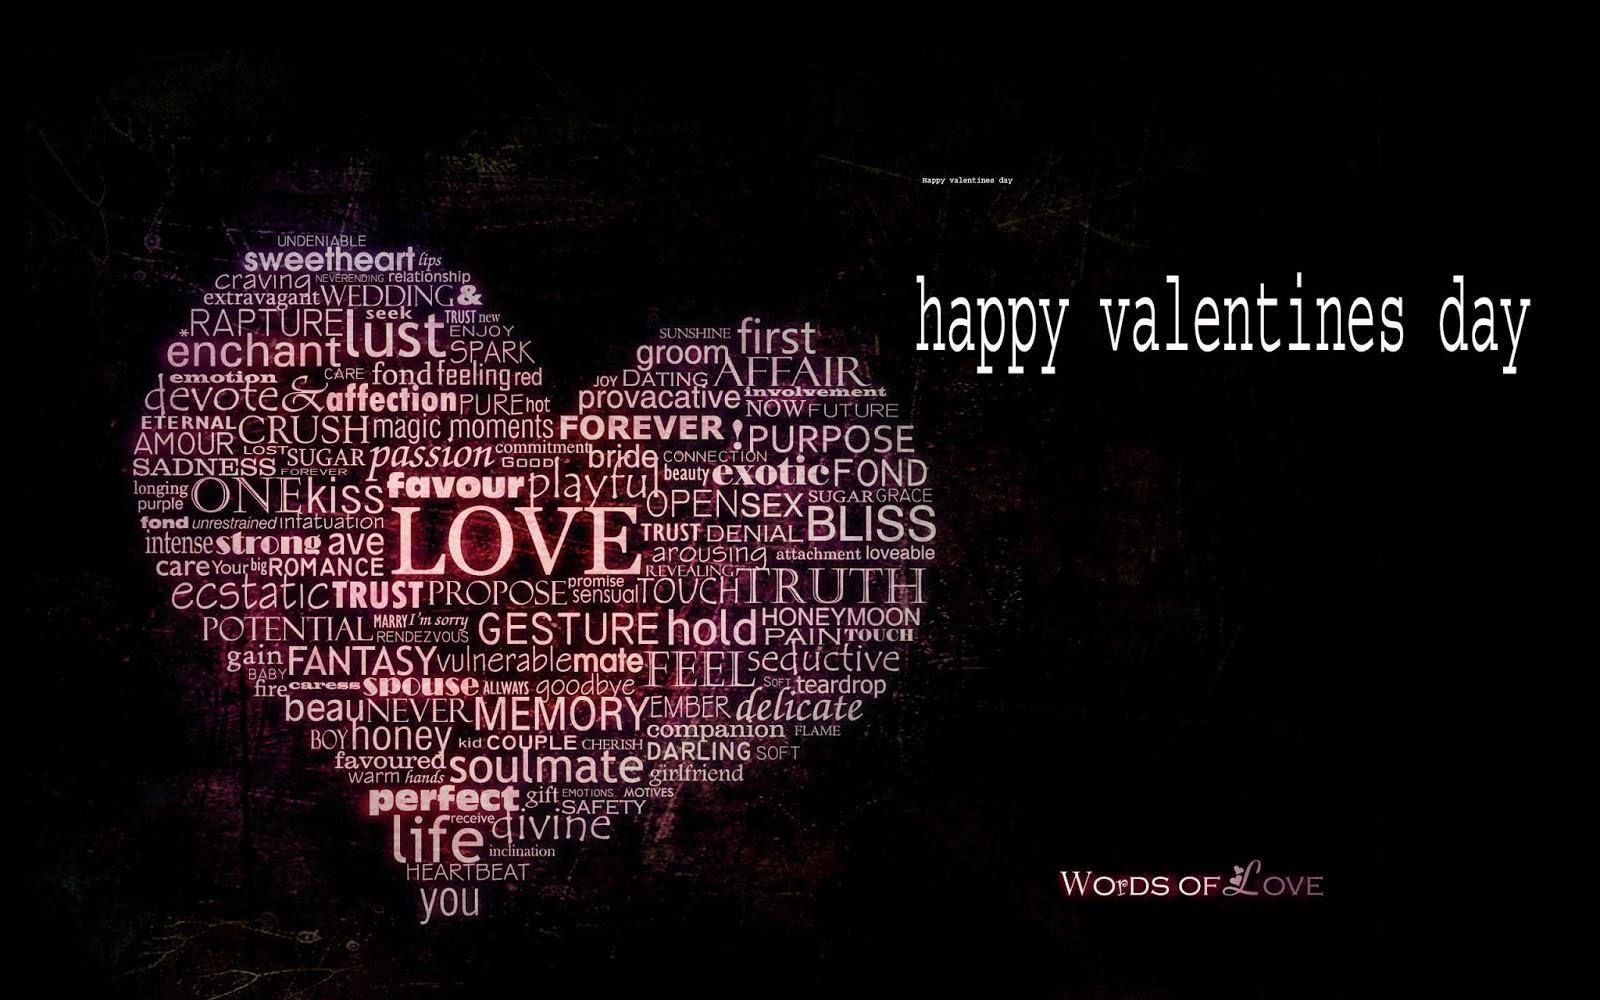 https://3.bp.blogspot.com/-WkbOMJ00wTg/UXz1es7PgkI/AAAAAAAABLA/kIv-RK-fvFw/s1600/valentine+day+wallpaper+14.jpg